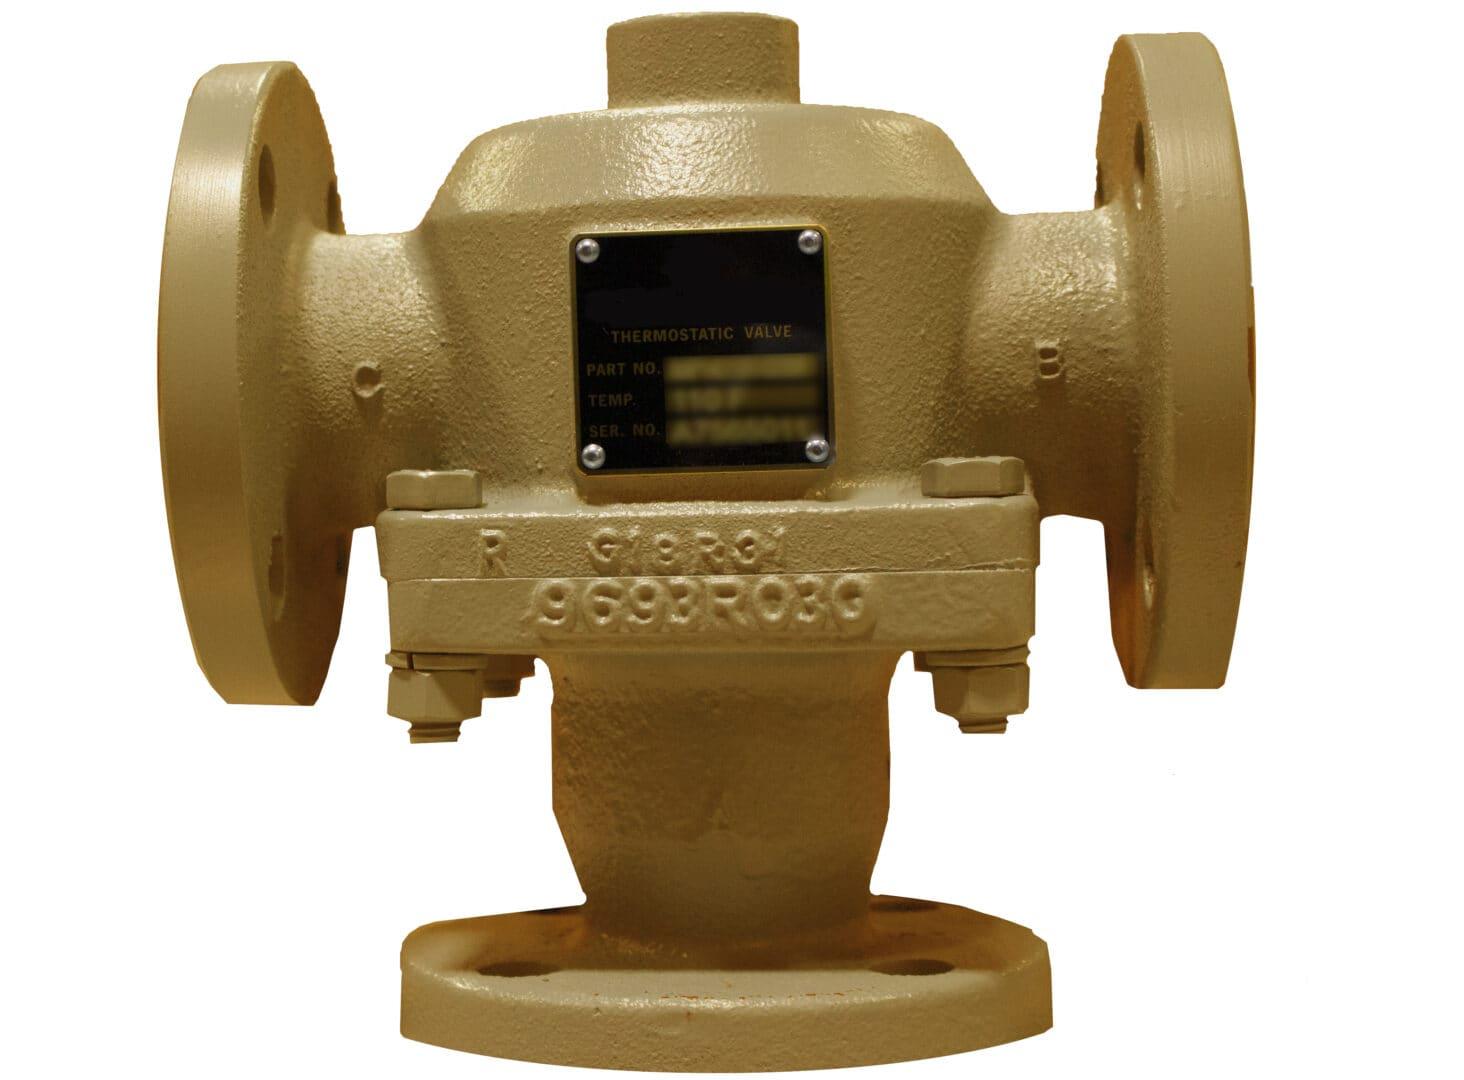 rdl hydraulics amot 2bc 1464x1080 - Amot